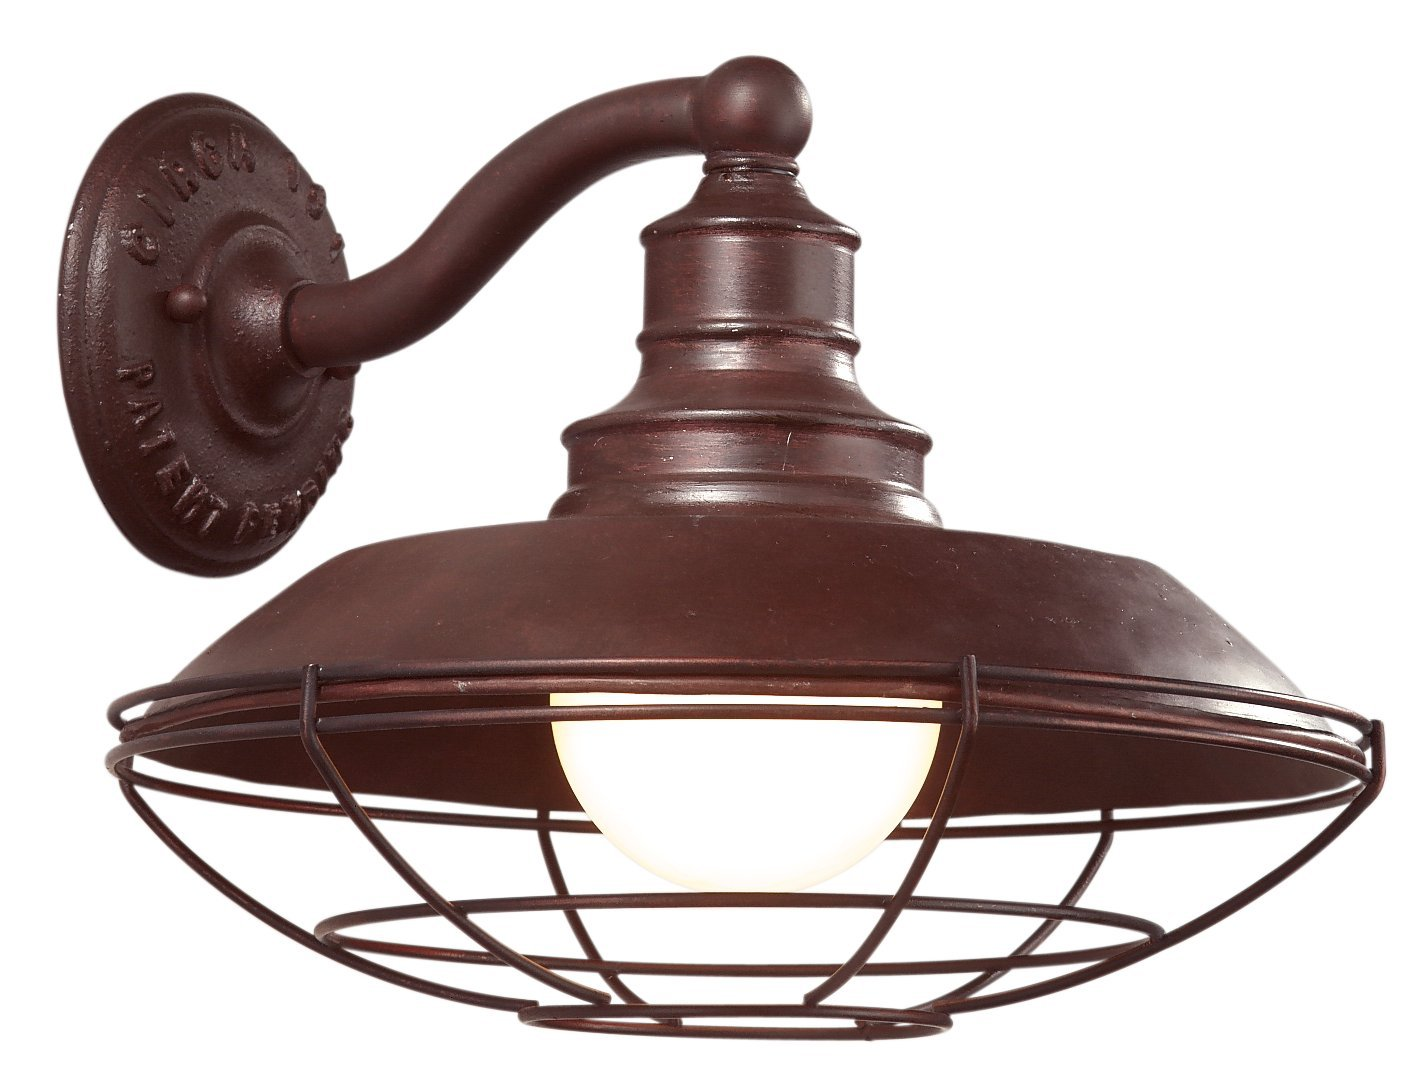 Amazon troy lighting circa 1910 12w outdoor wall light old amazon troy lighting circa 1910 12w outdoor wall light old rust finish home improvement arubaitofo Gallery